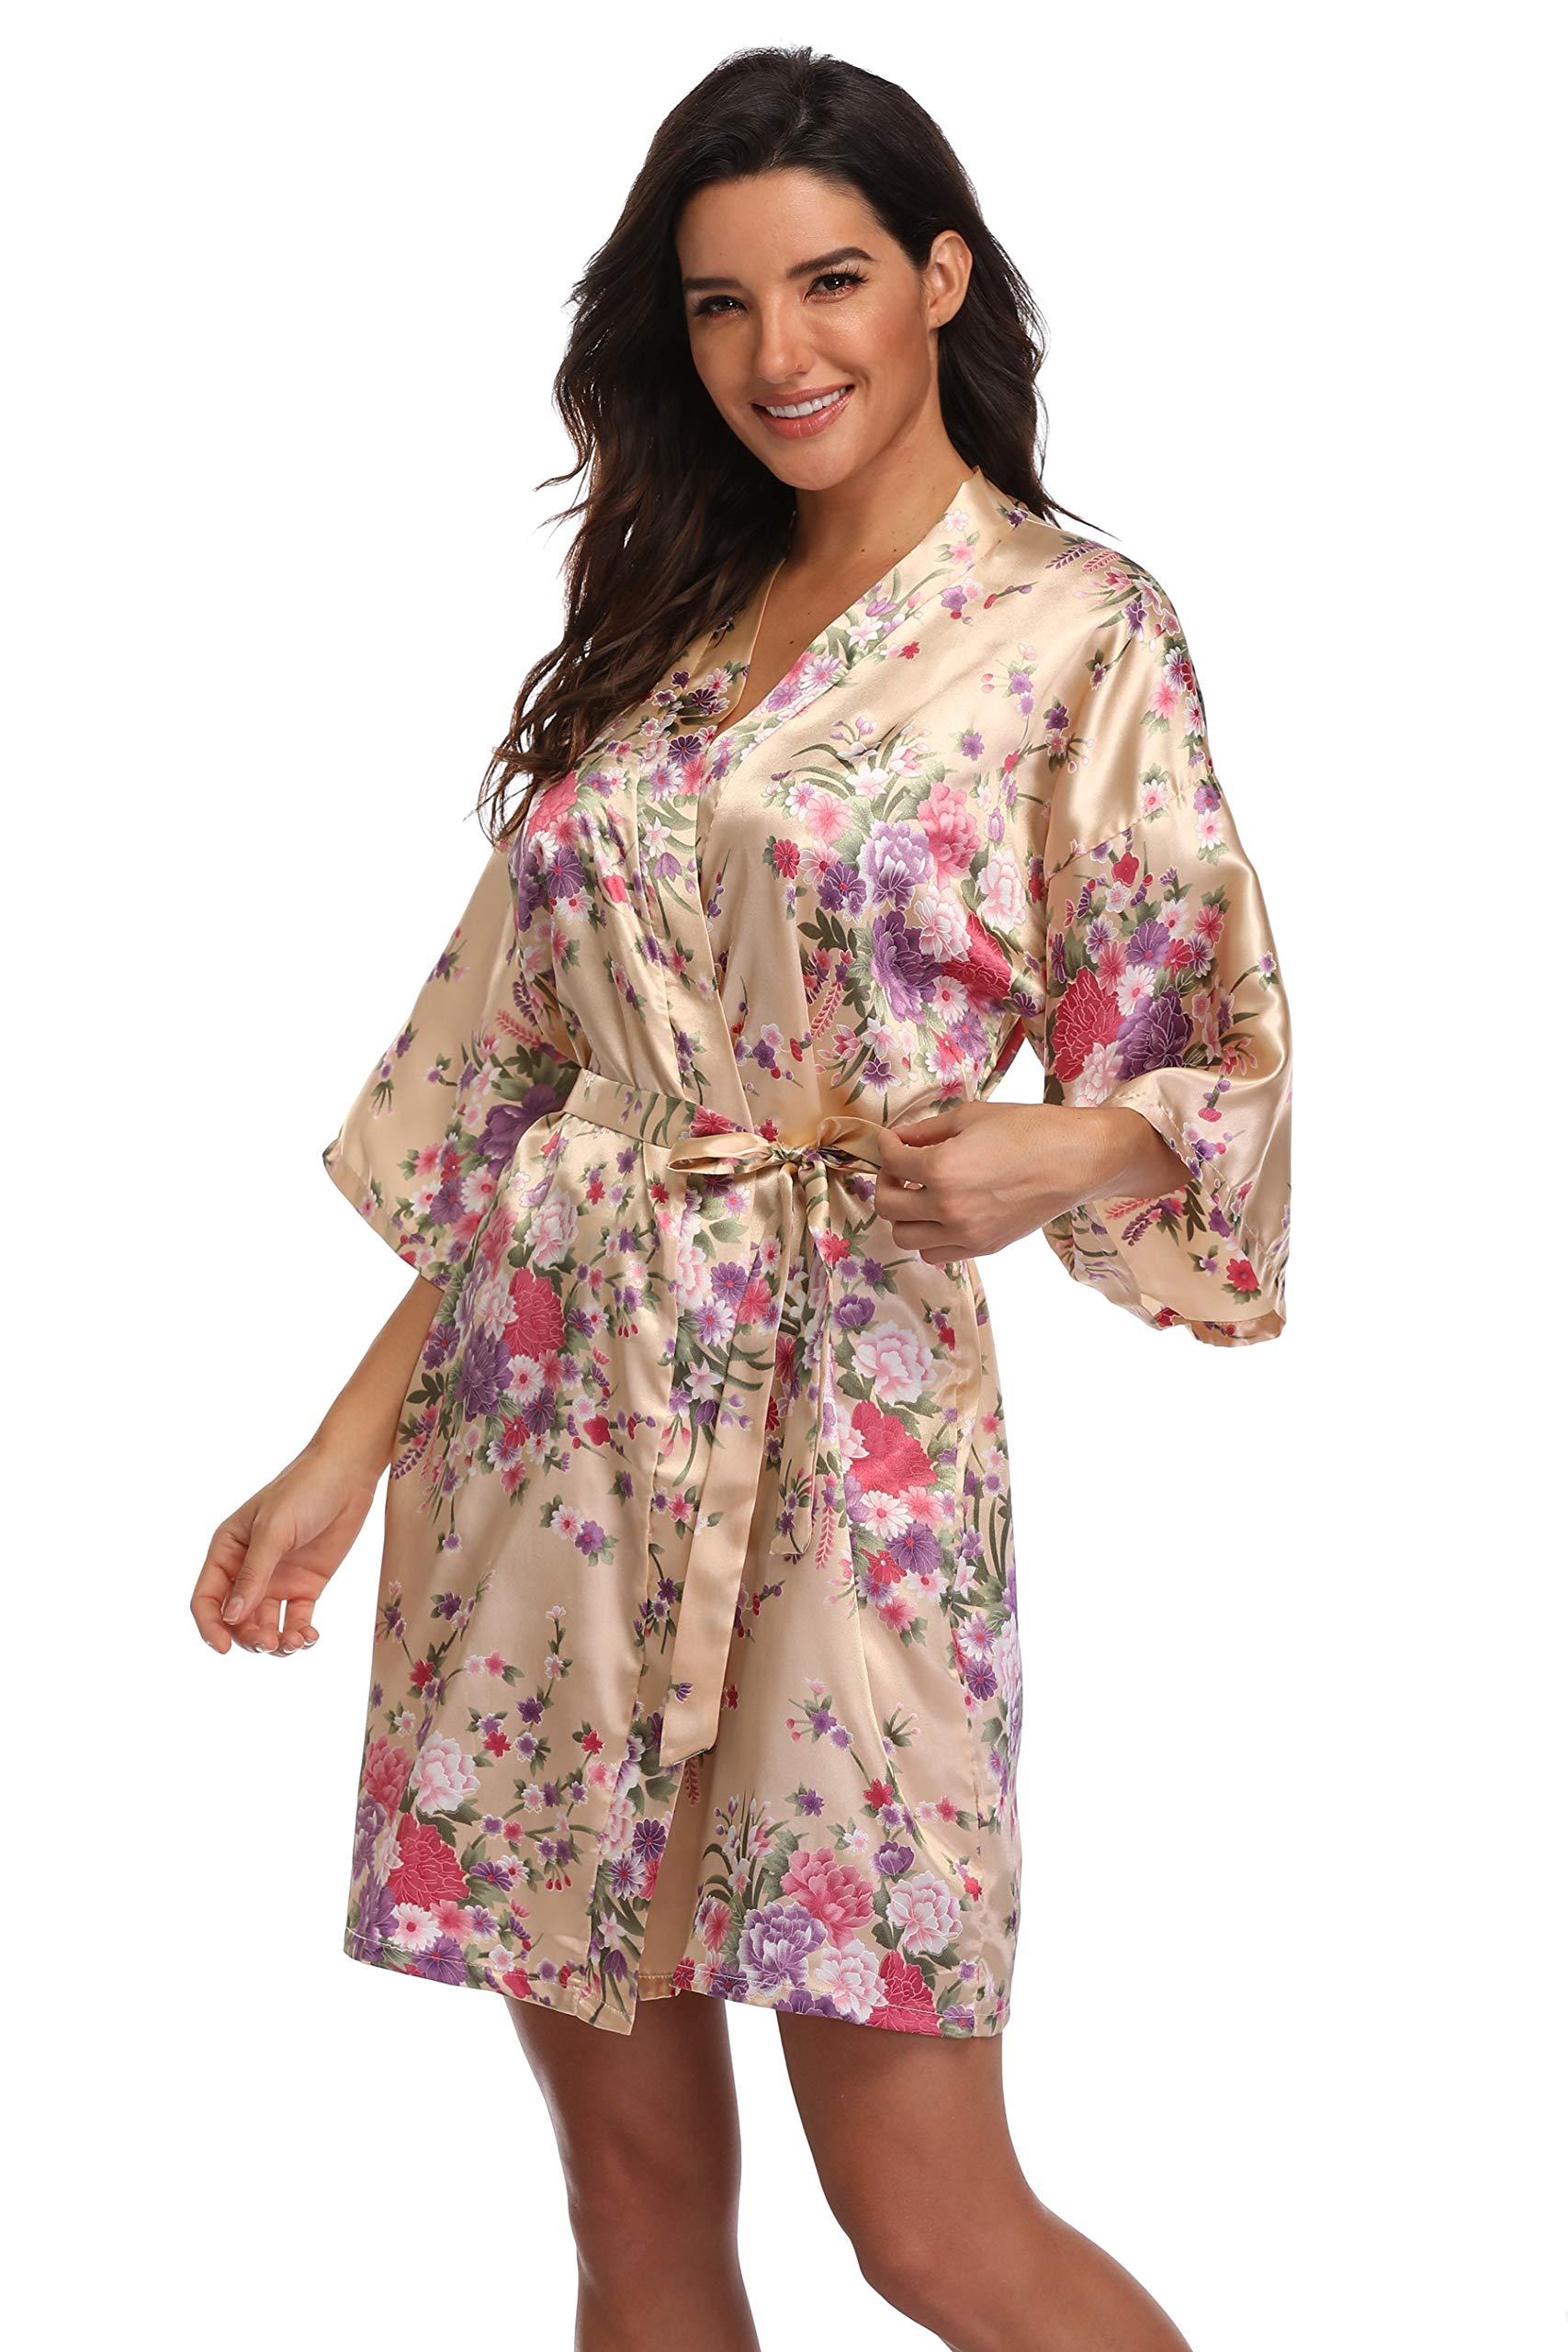 sophiashopping Women's Floral Robe Bridemaids Satin Kimono Dressing Gown Short Sleepwear